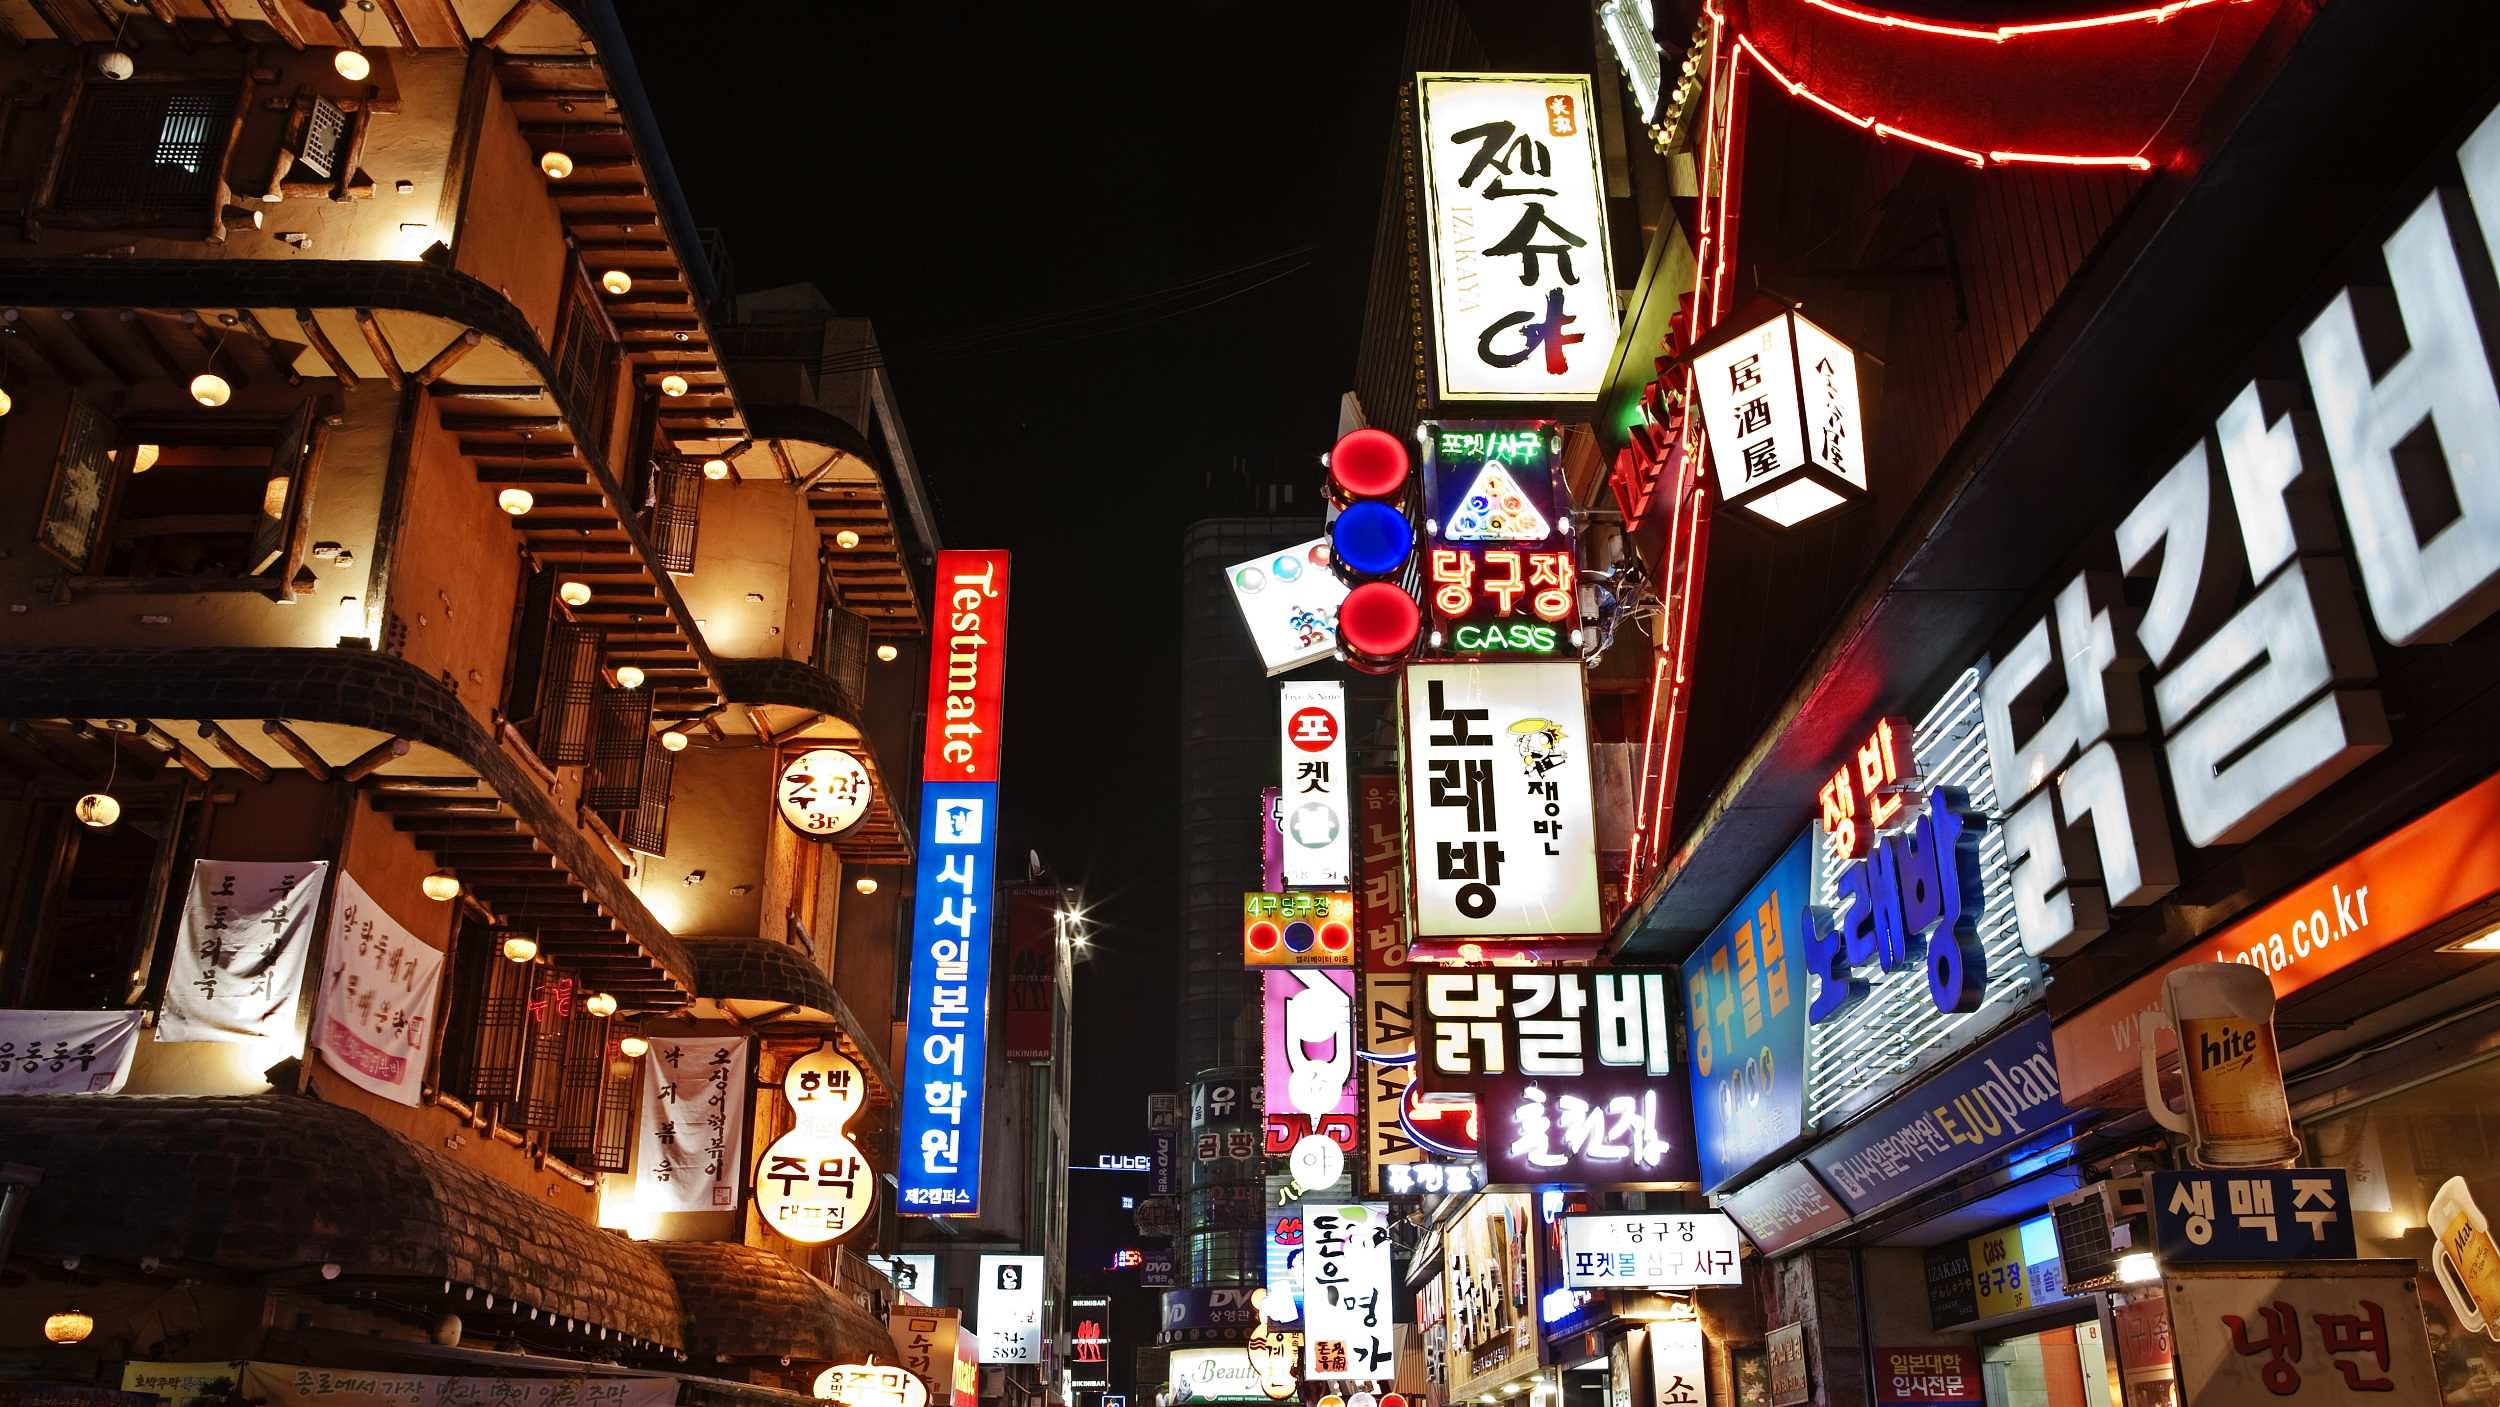 S. Korea's producer price falls due to pork price